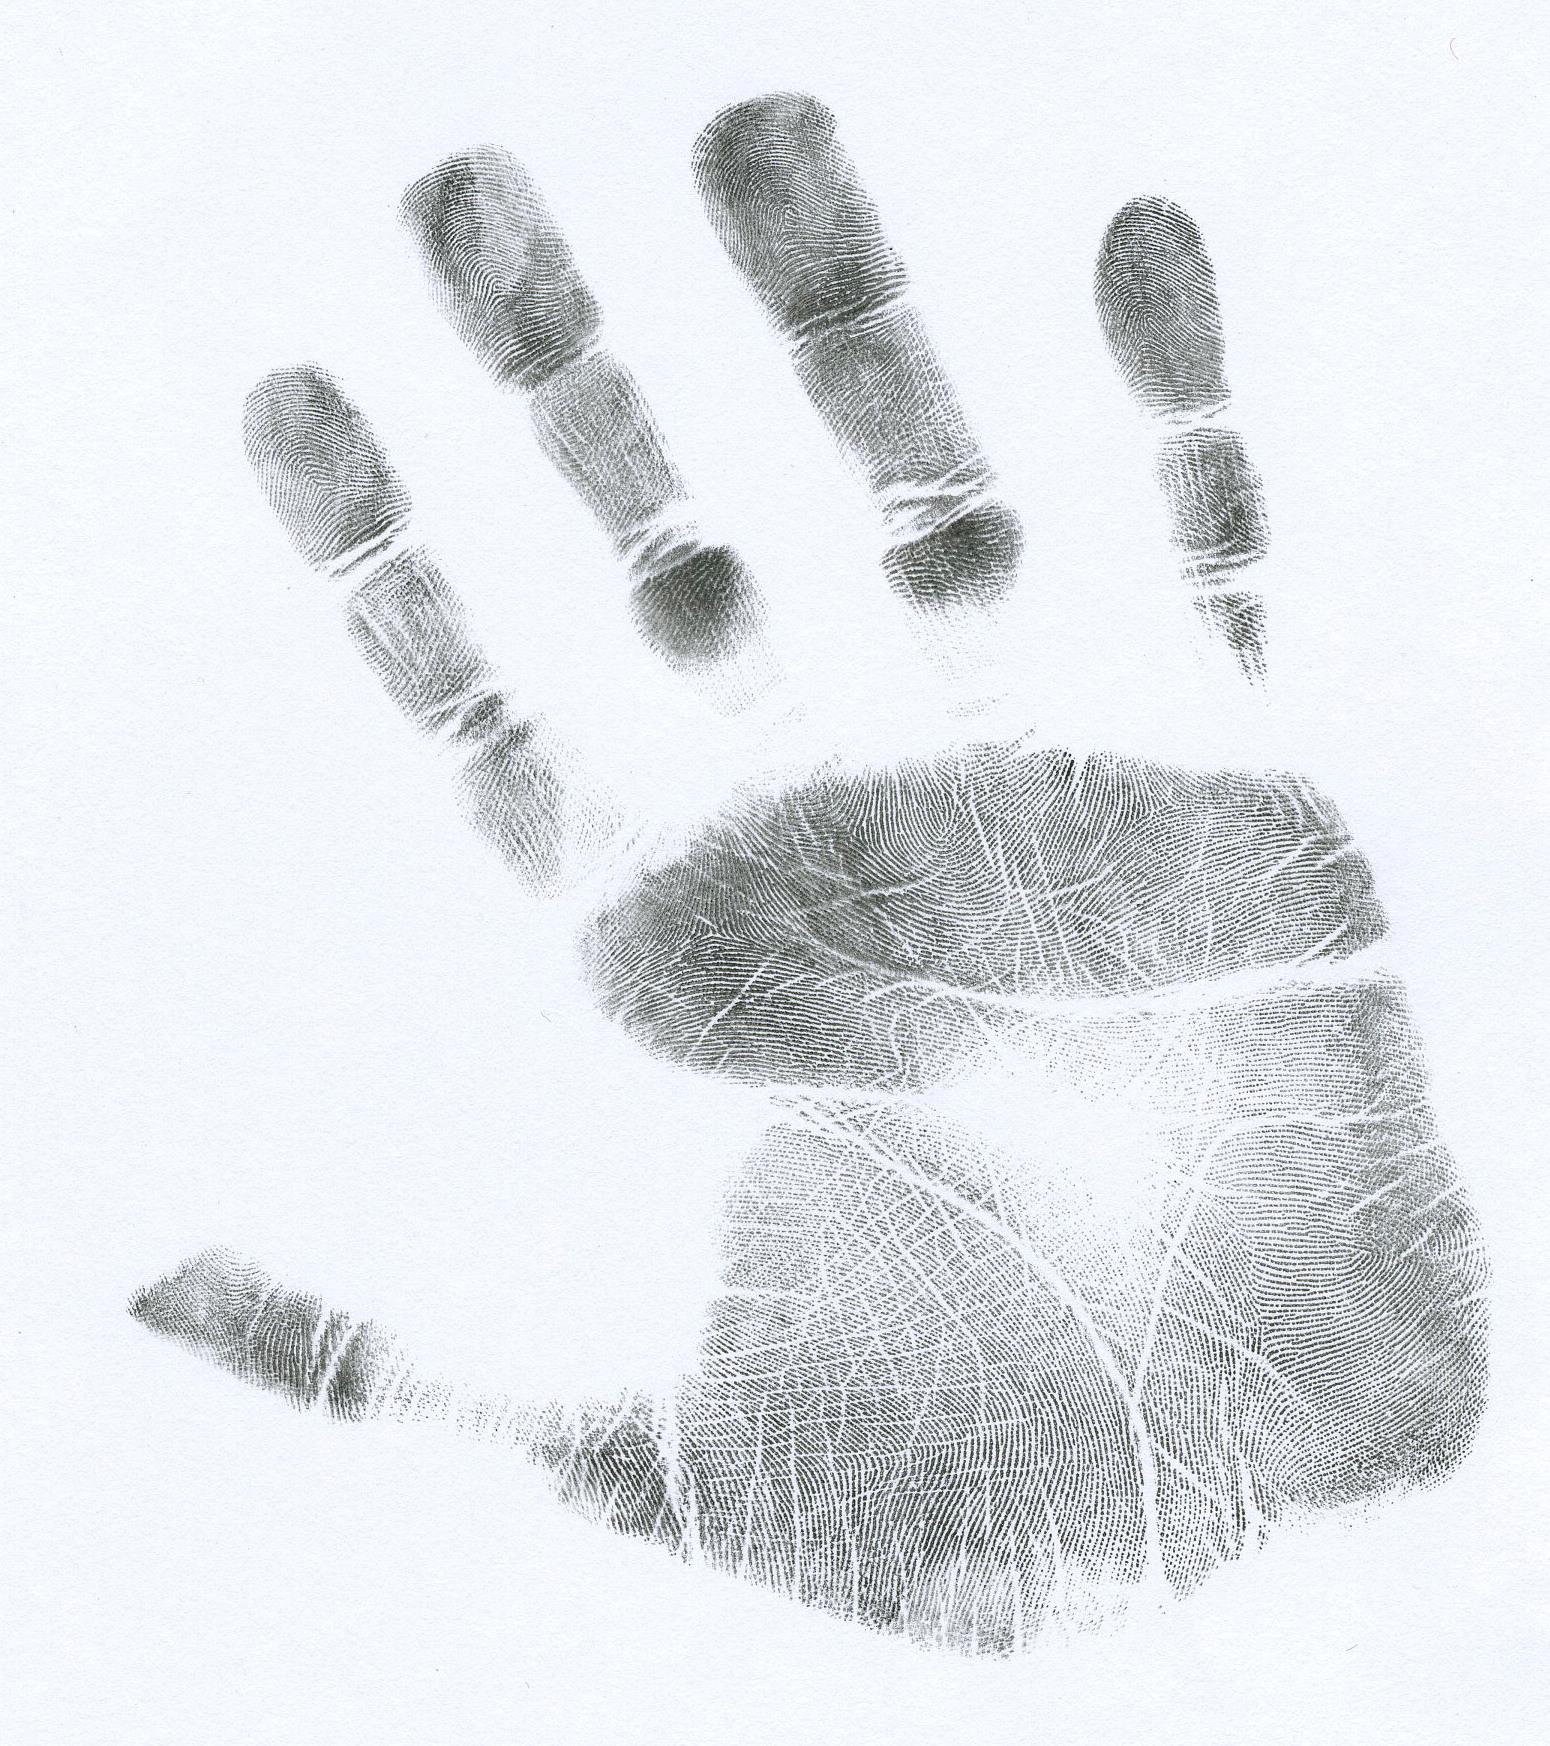 hand print hand - photo #39